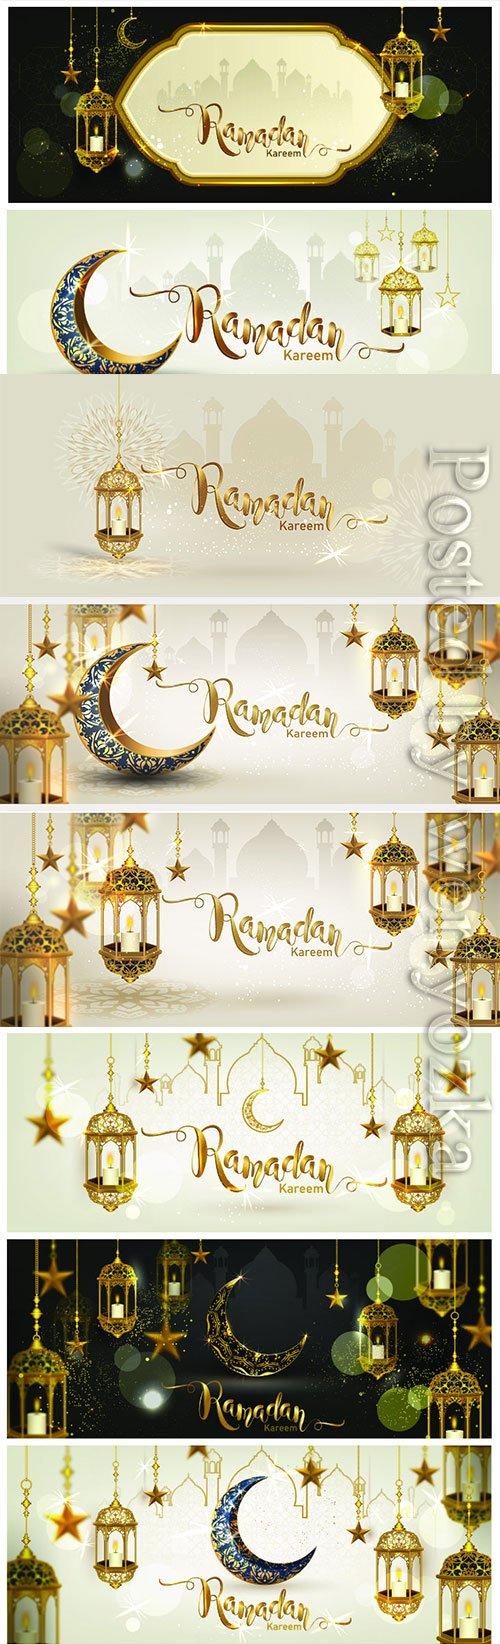 Ramadan Kareem with gold luxurious crescent,  islamic ornate element